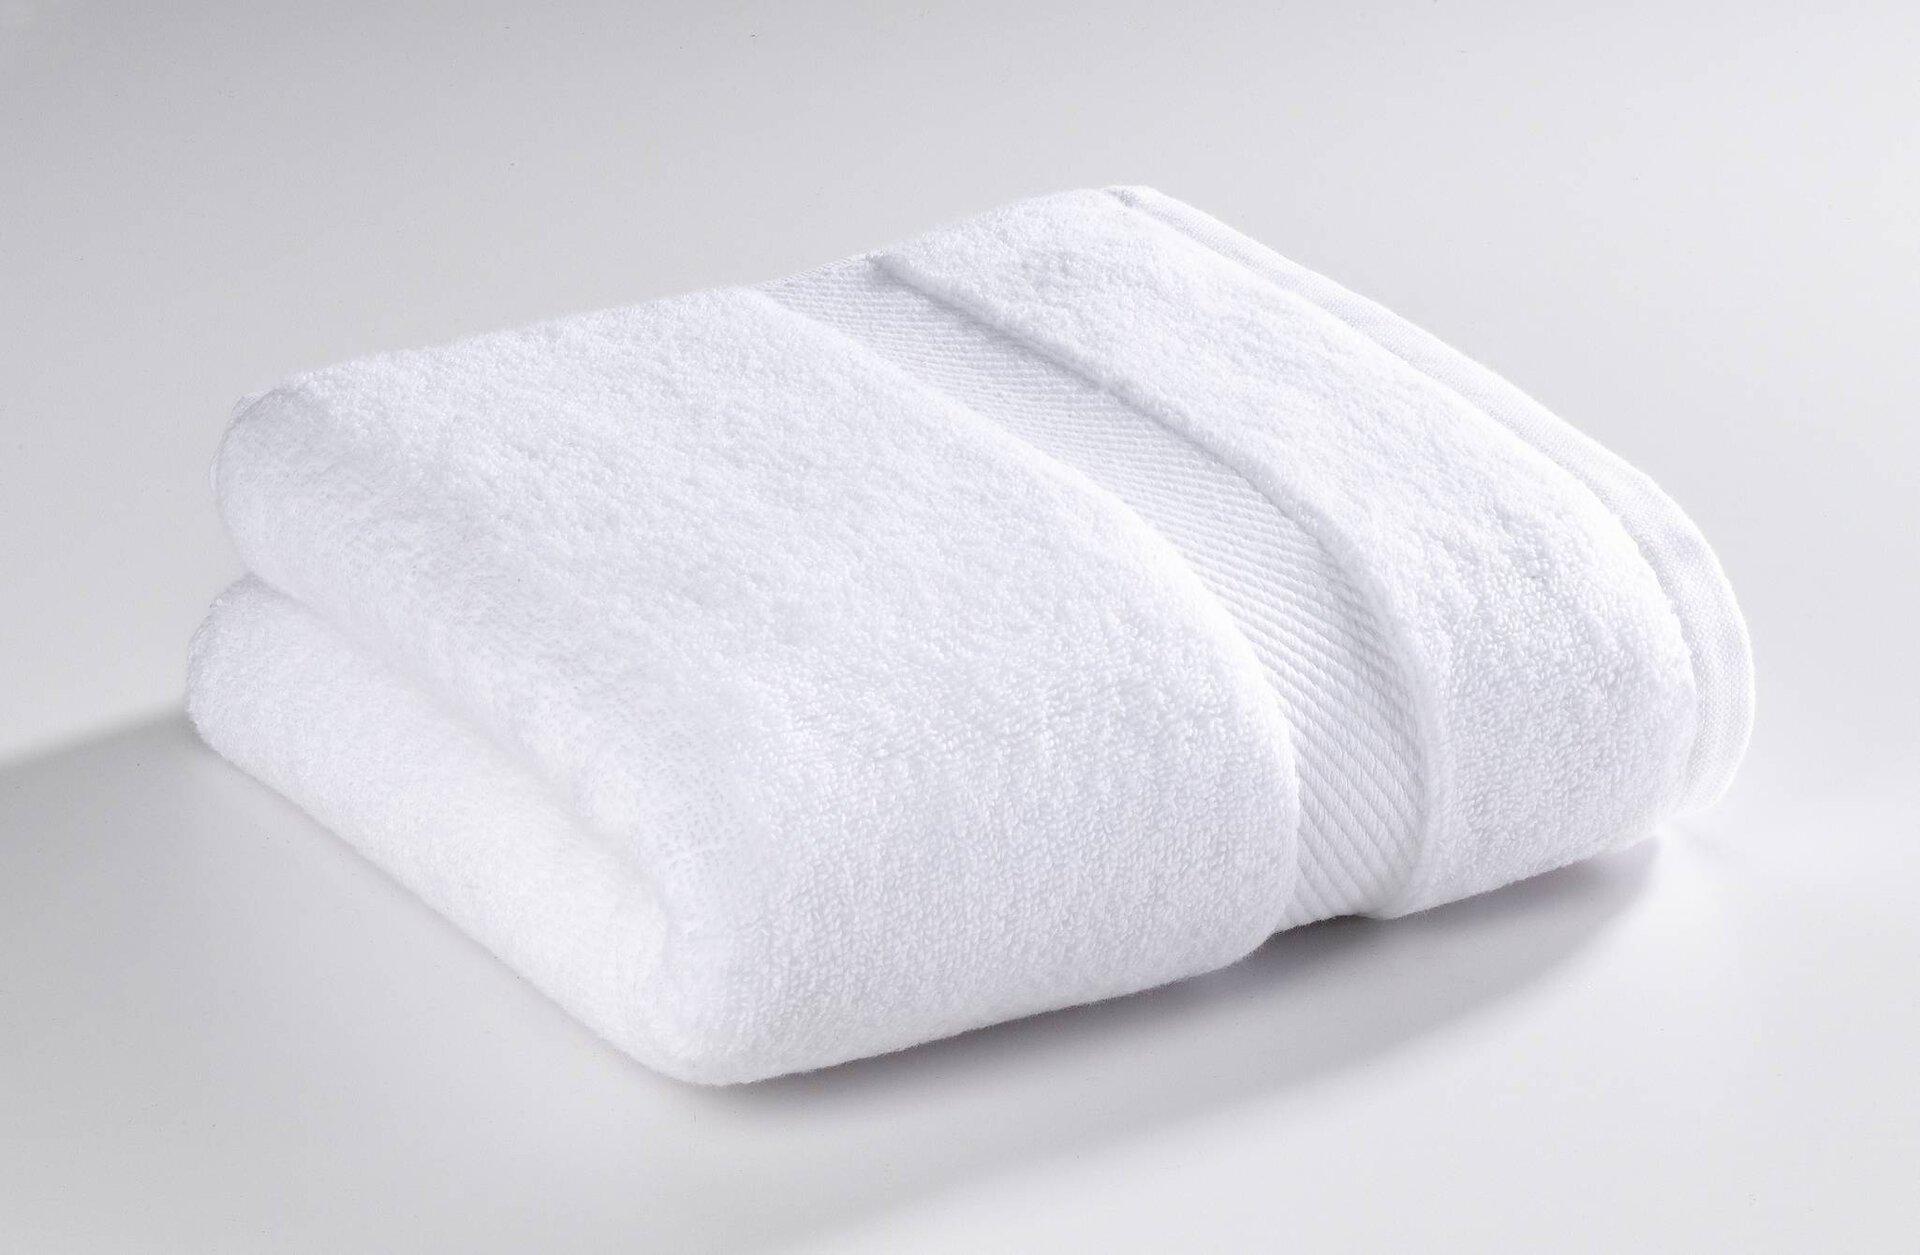 Handtuch Micro Baumwolle Casa Nova Textil weiß 50 x 100 cm